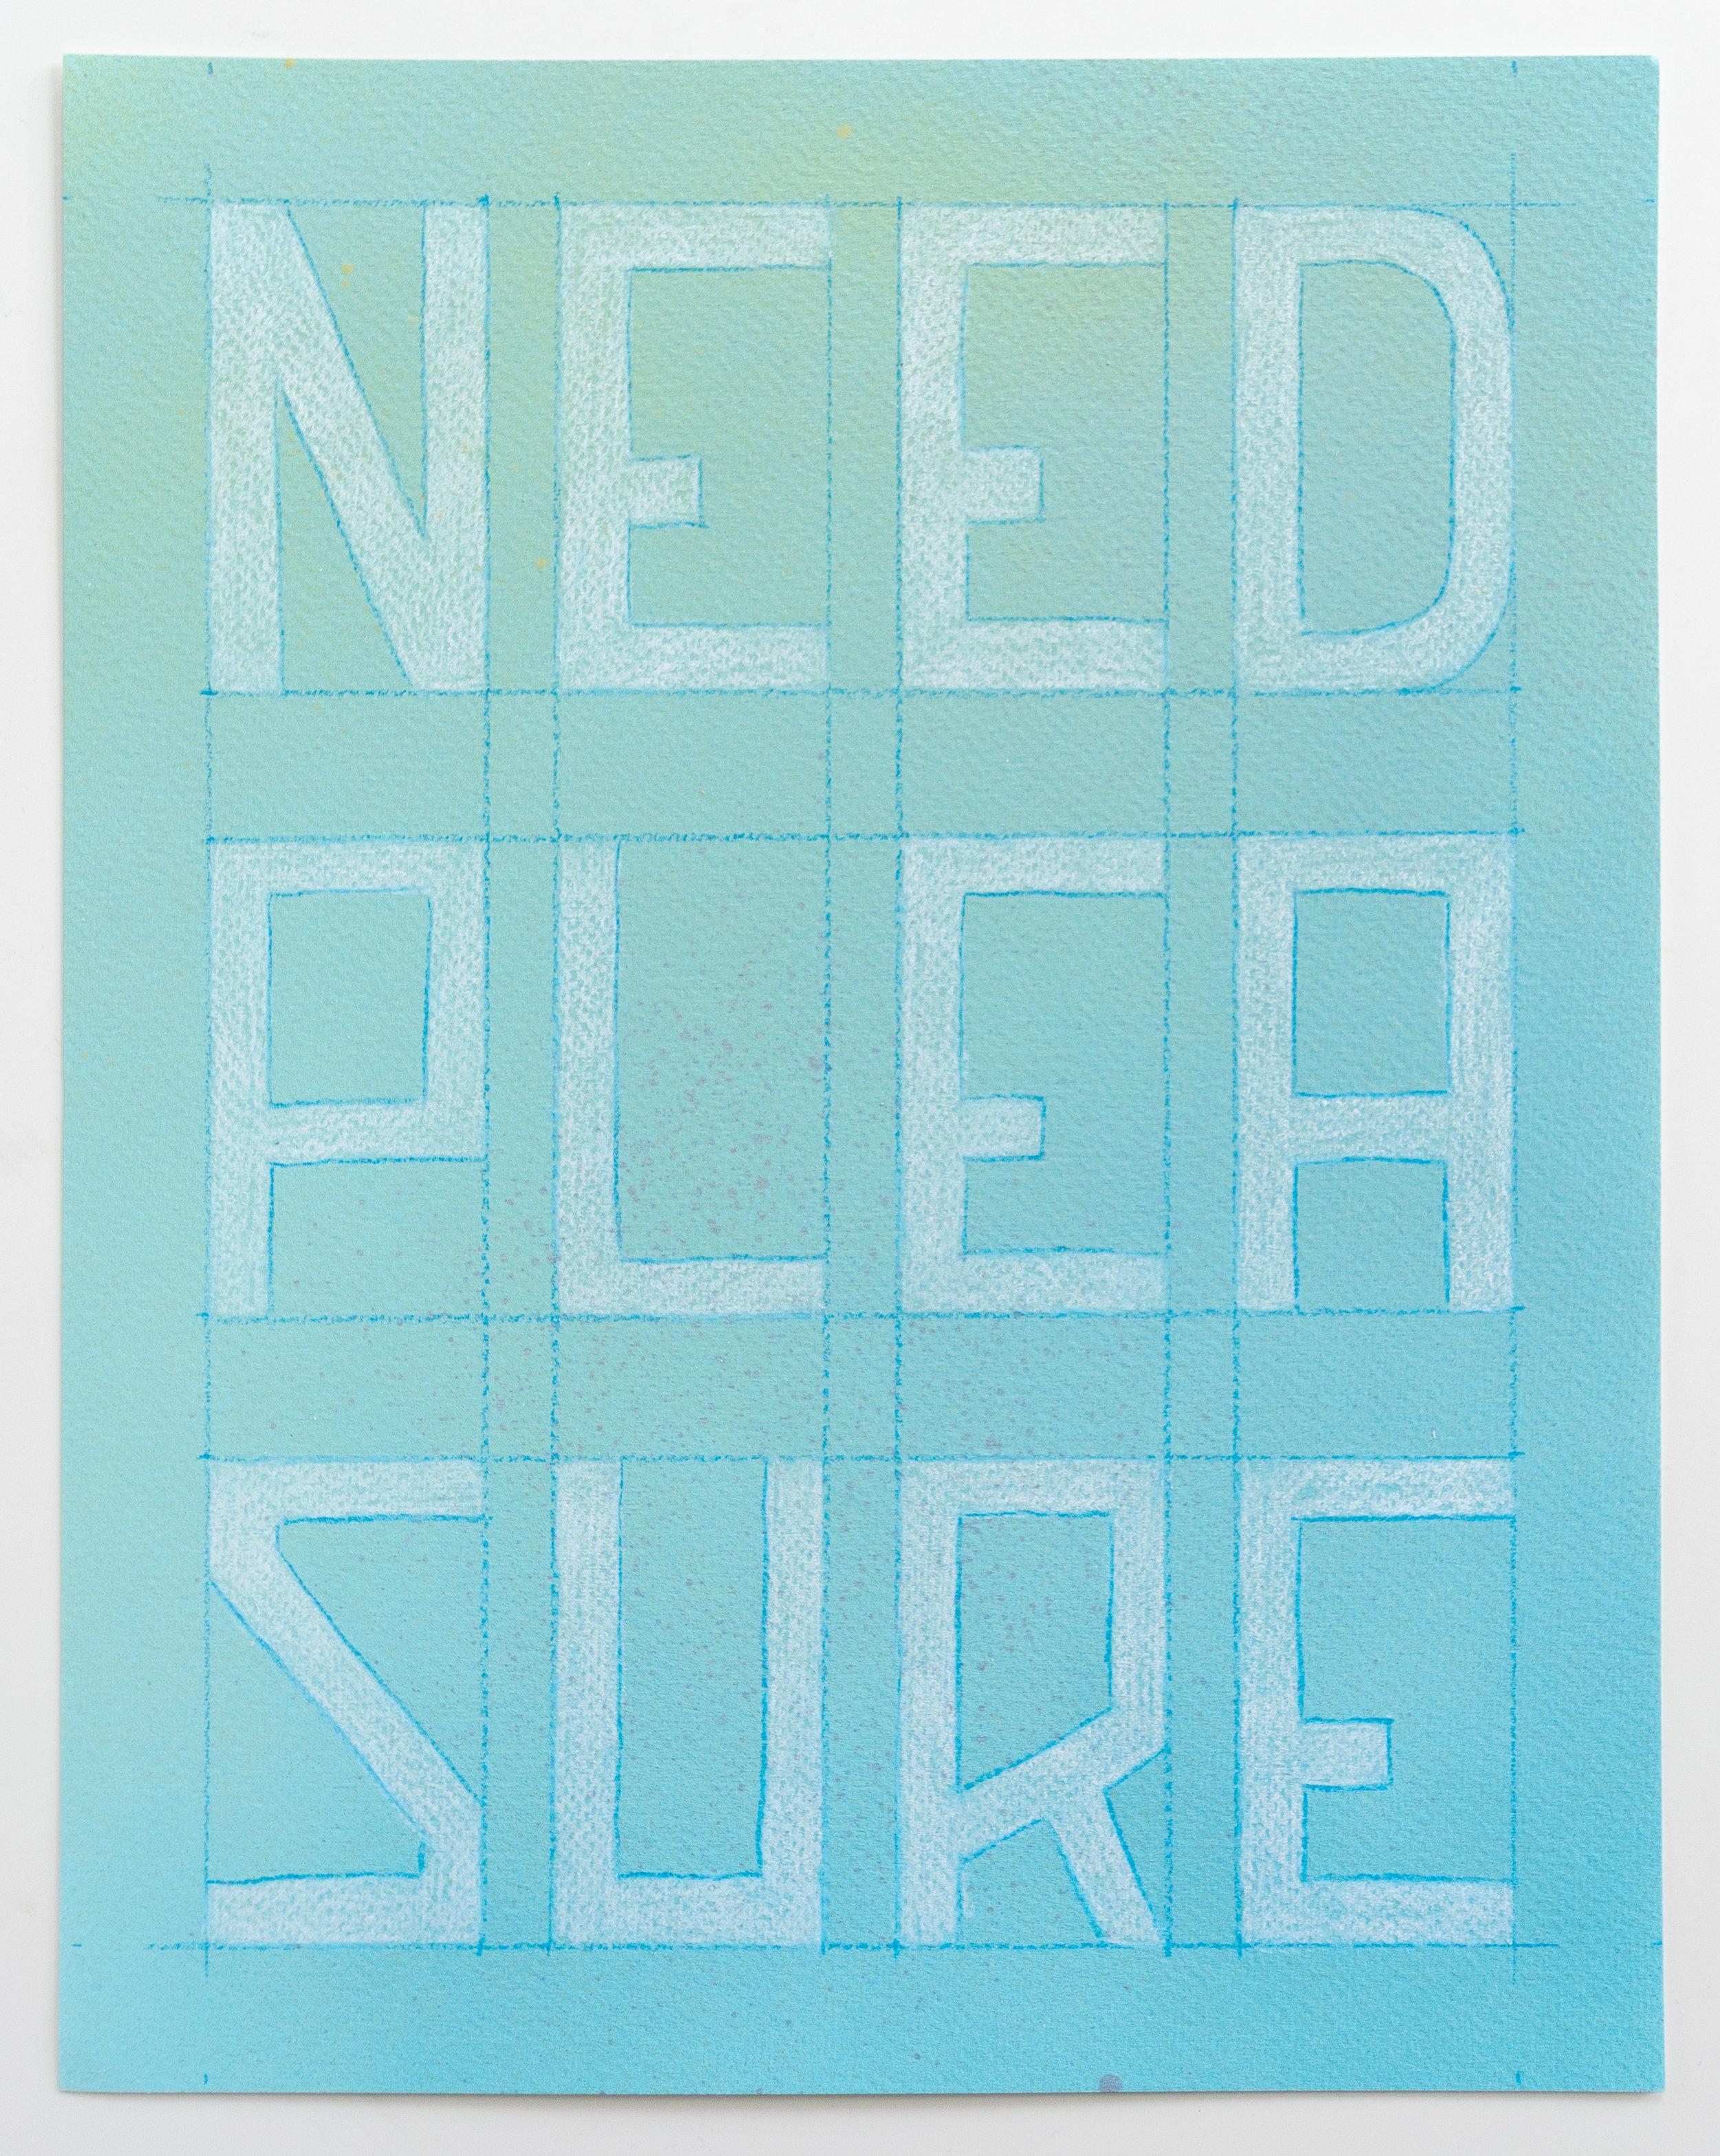 Wants Versus Desire (Need Pleasure)  Enamel, colored pencil, watercolor paper  11 x 14 inches  2017